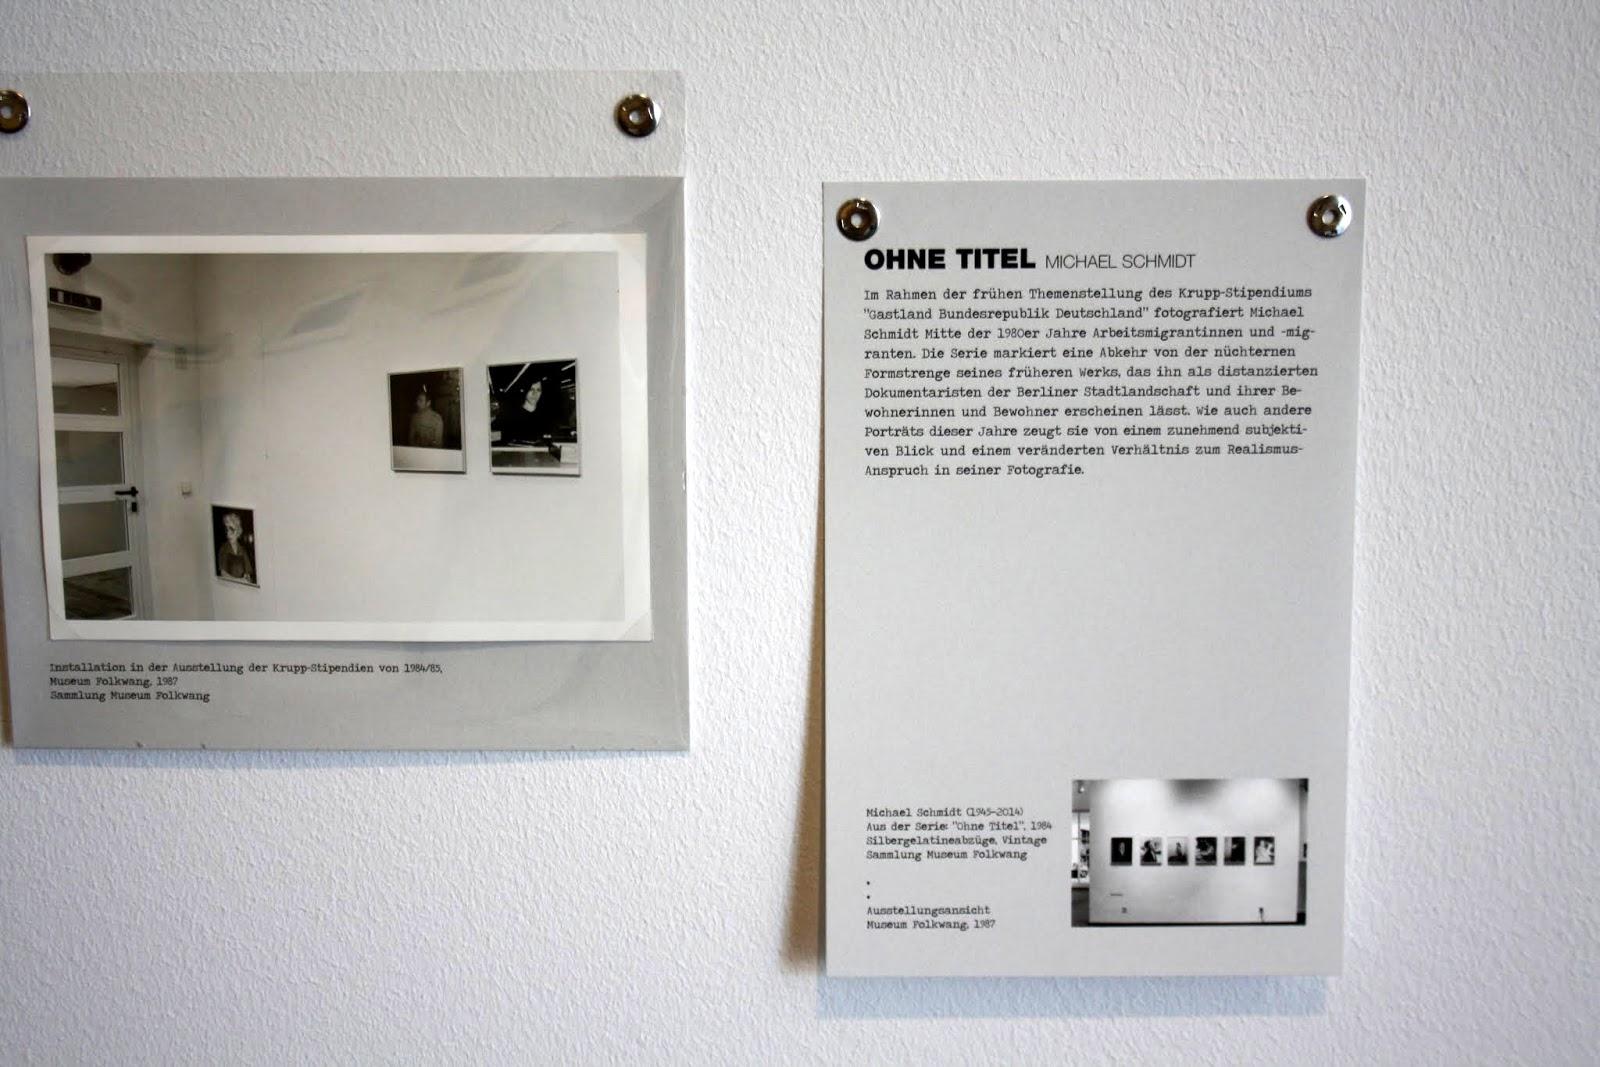 Charmant Rahmen An Michaels Galerie - Bilderrahmen Ideen - szurop.info